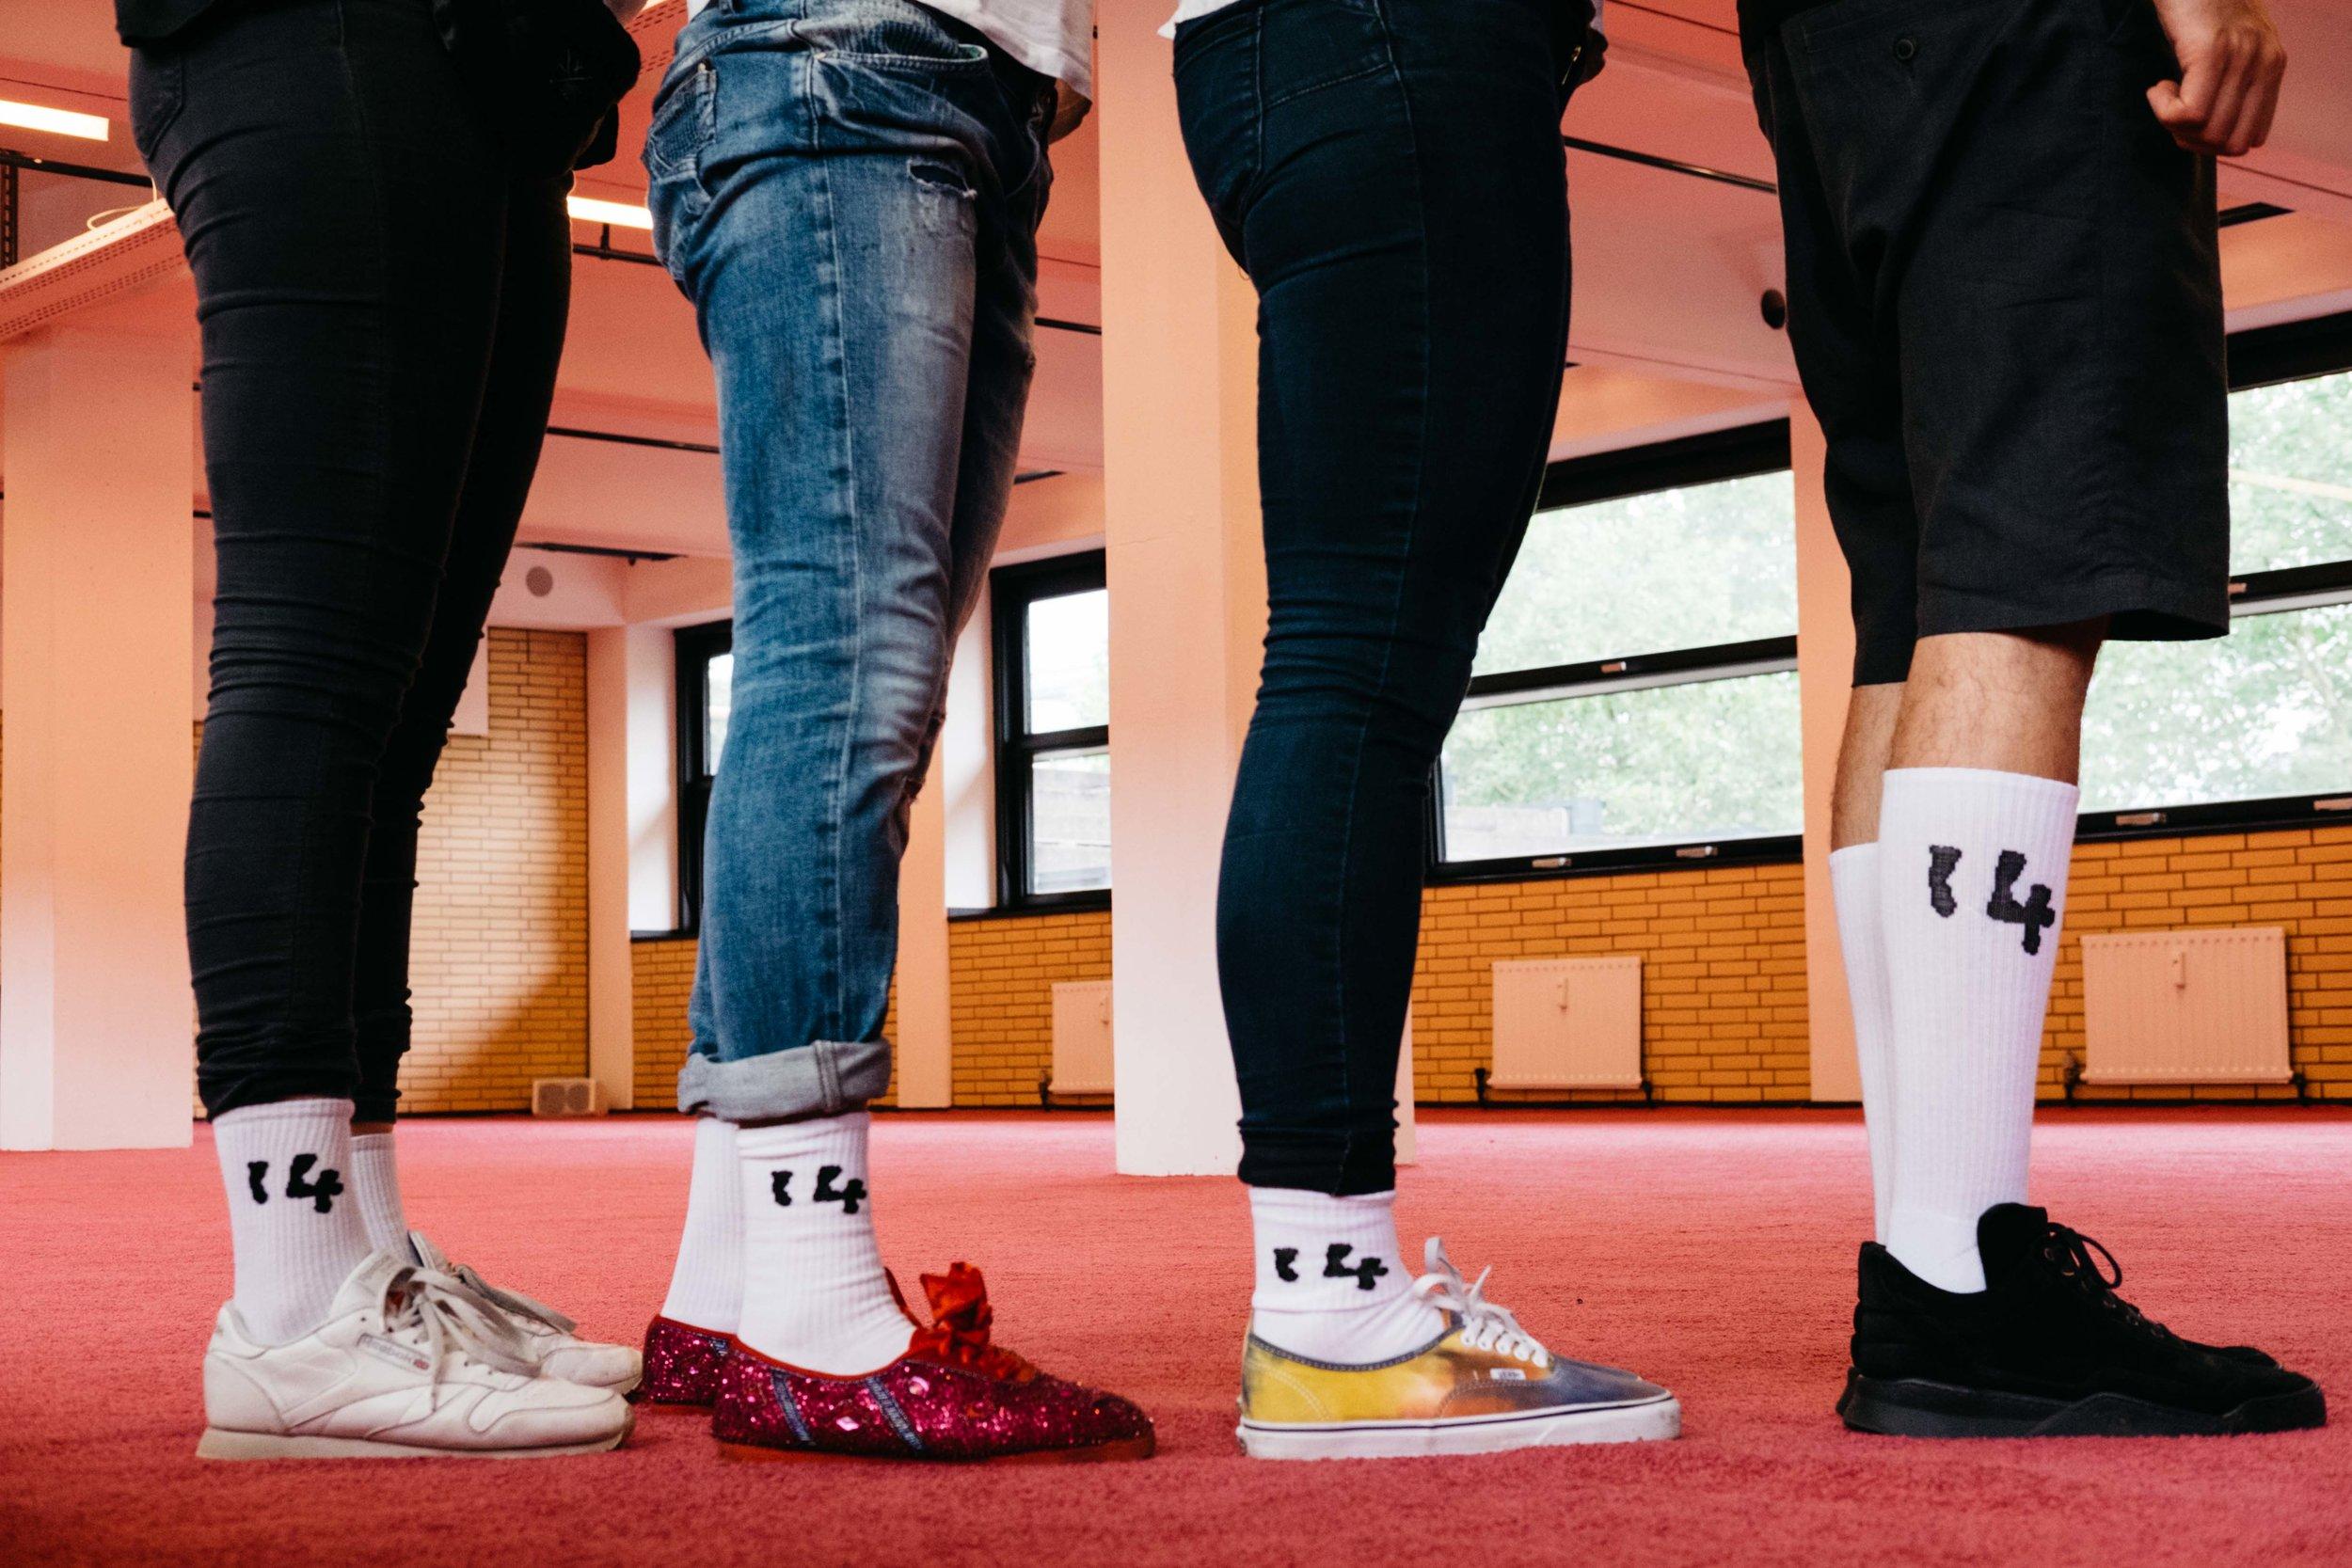 documenta14-kassel-kunst-wearecity-simonhariman-2017-47.jpg